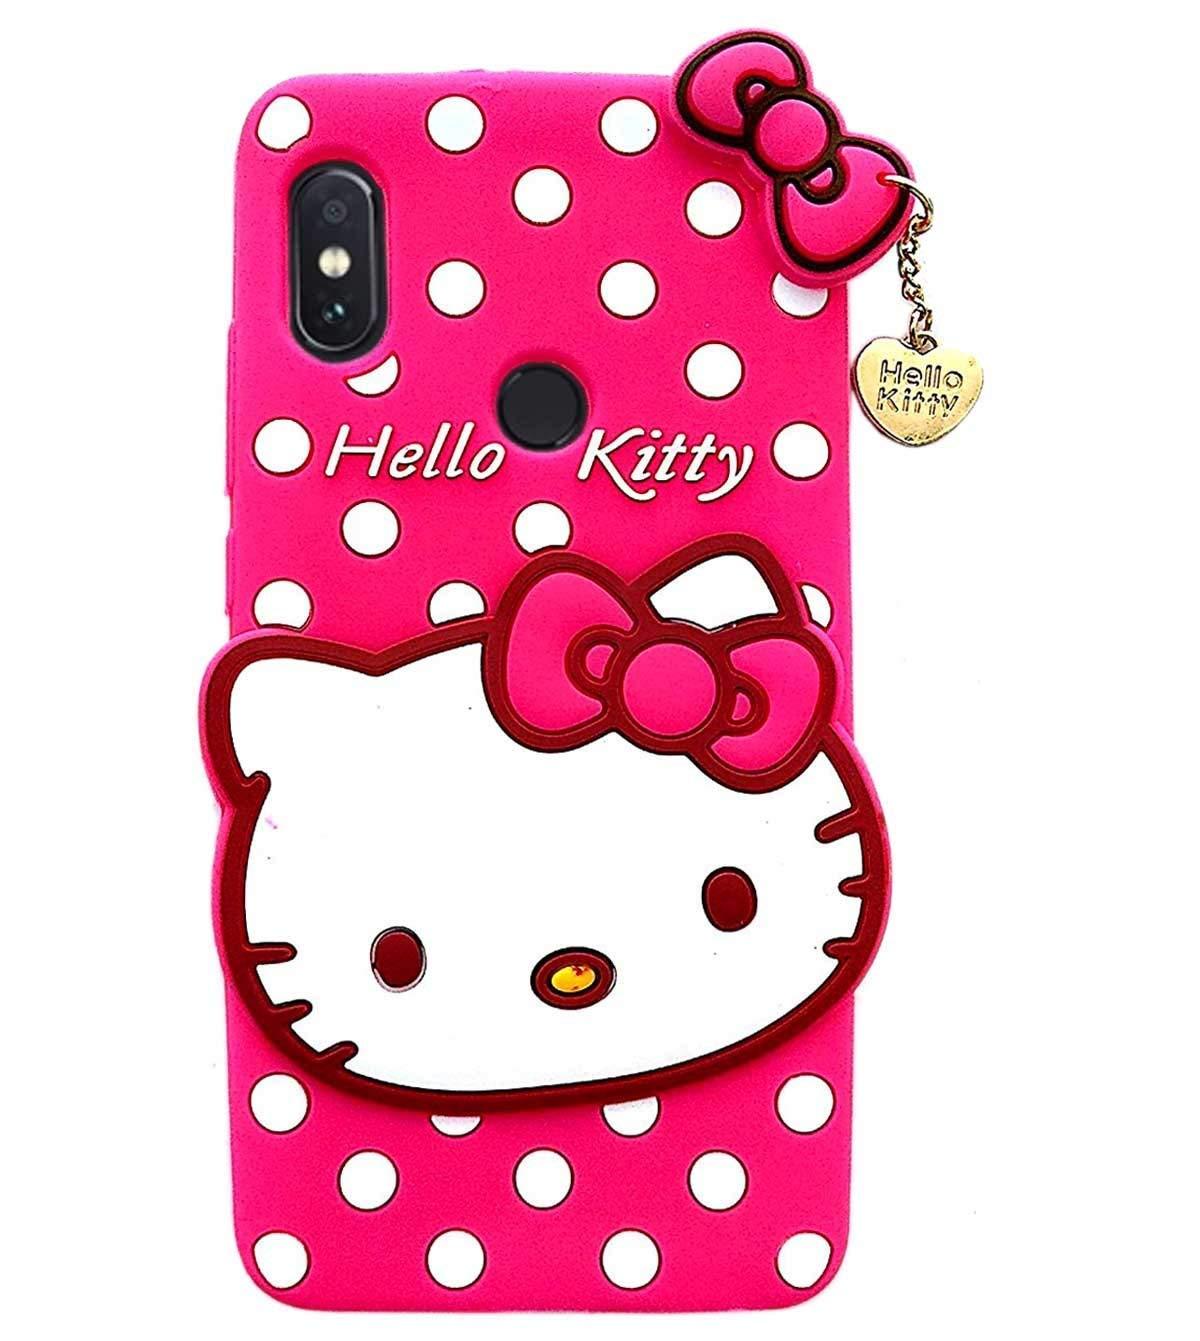 Trifty Cute Hello Kitty for Vivo V11 - Pink